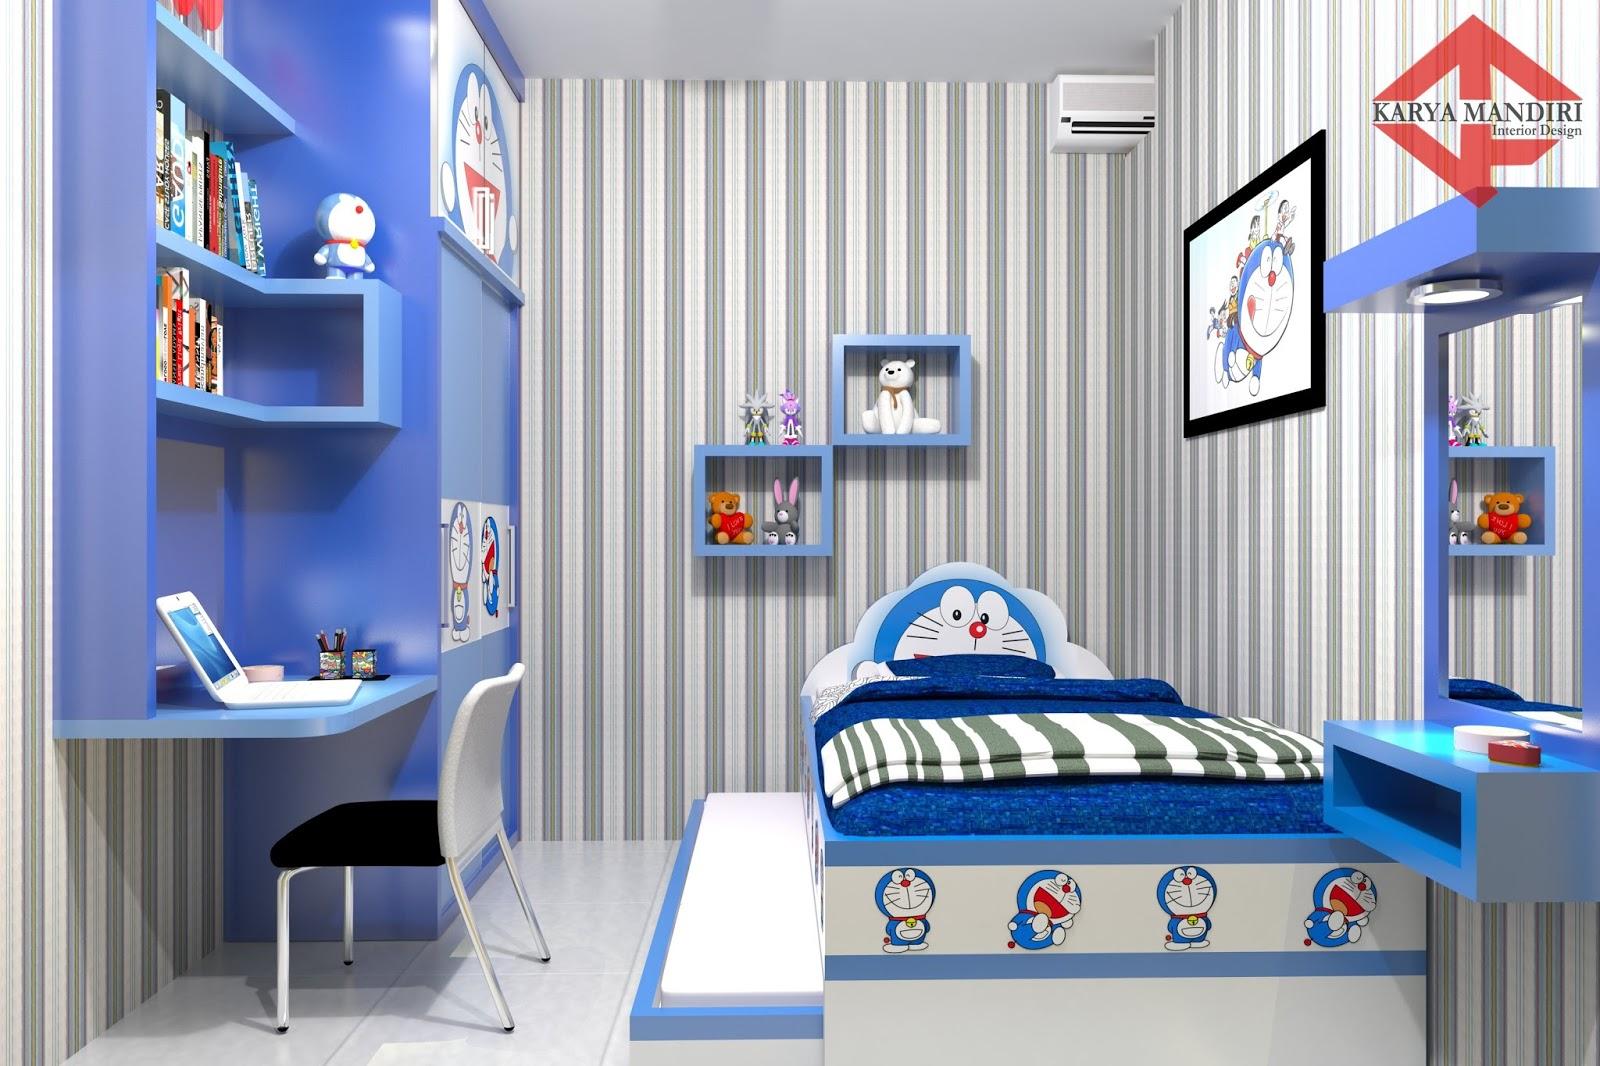 Gaya Terbaru 39 Menghias Kamar Tema Doraemon Paling Unik